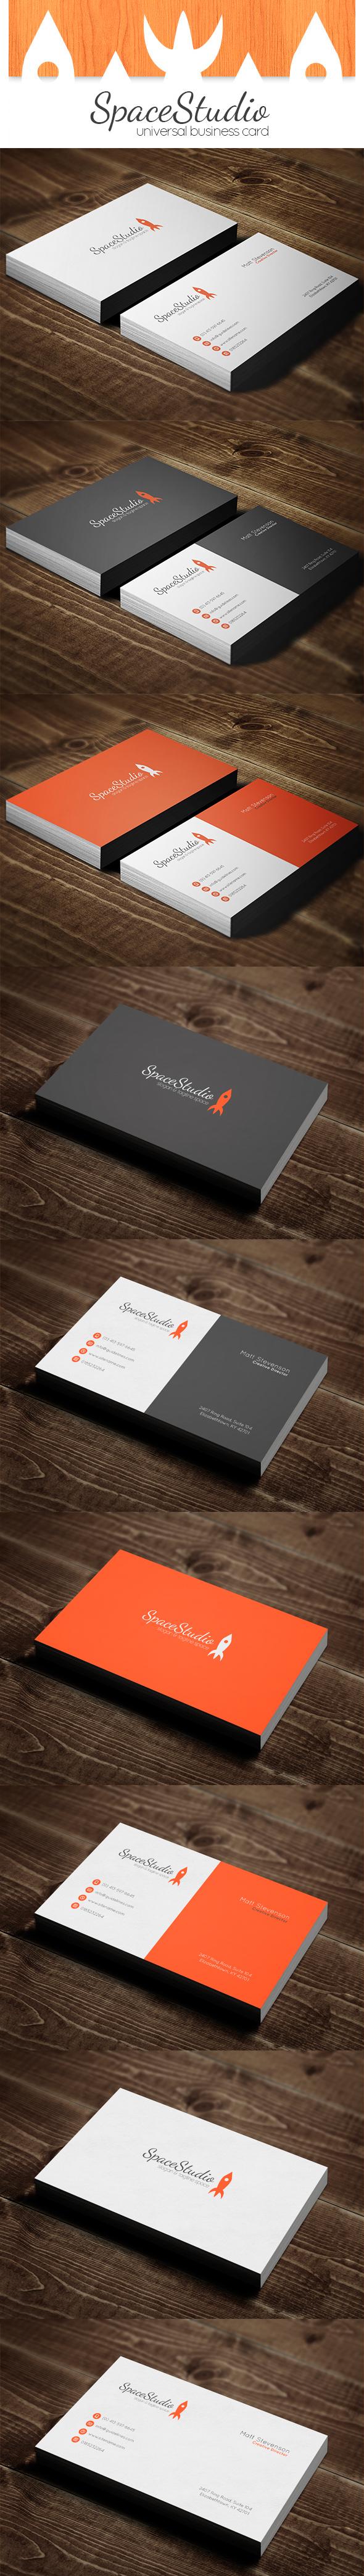 Rocket Business Card DOWNLOAD by polska753